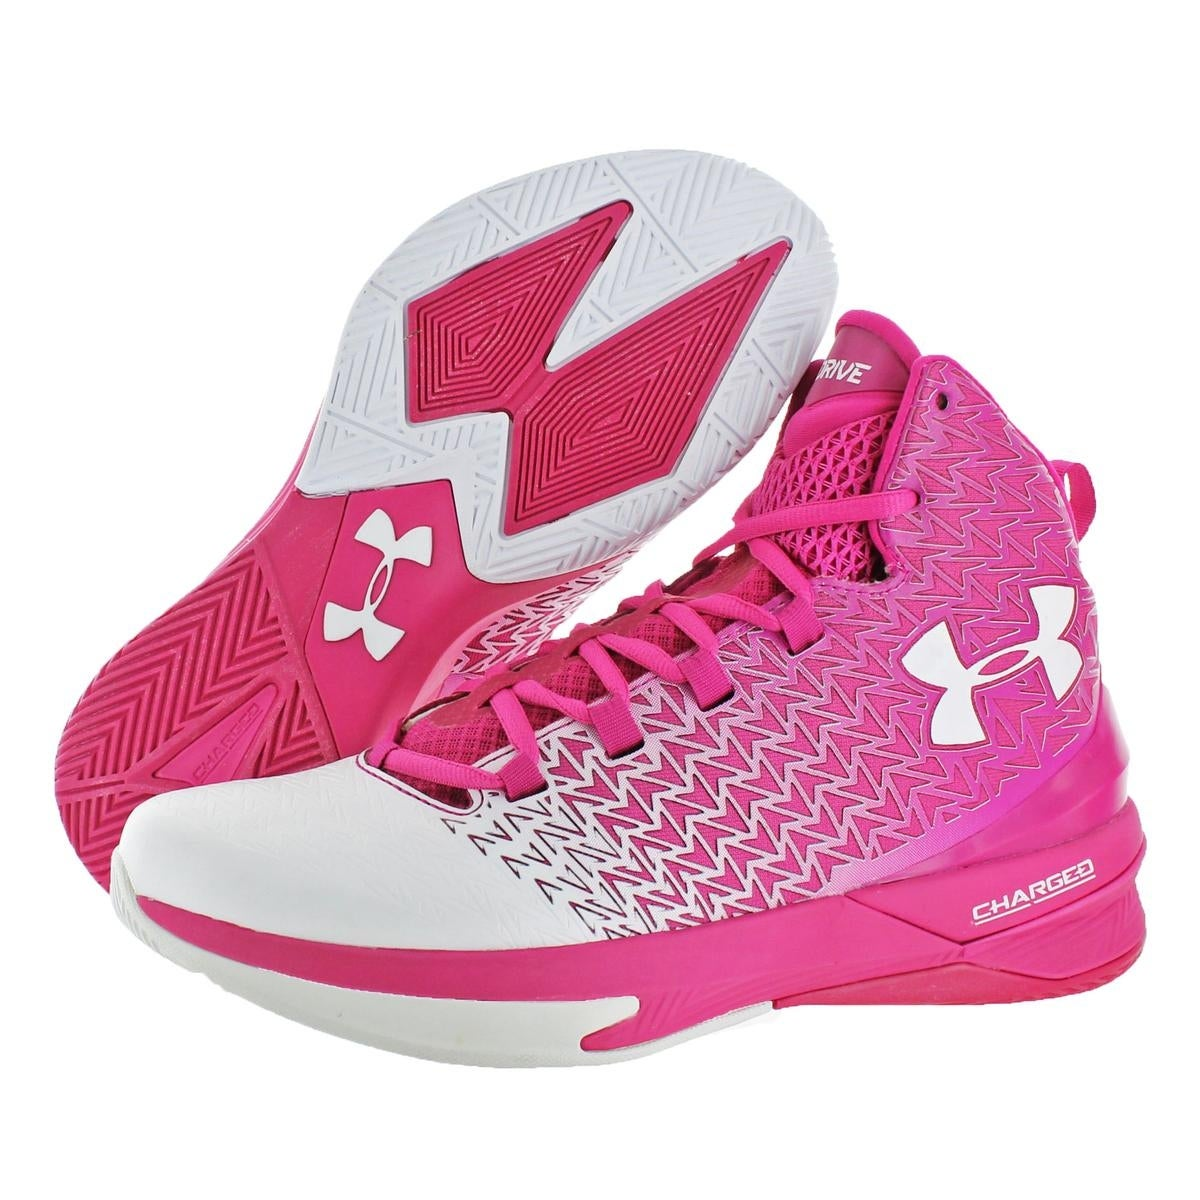 ebd3788bbb15 Shop Under Armour Mens Clutchfit Drive 3 Basketball Shoes High Top ...